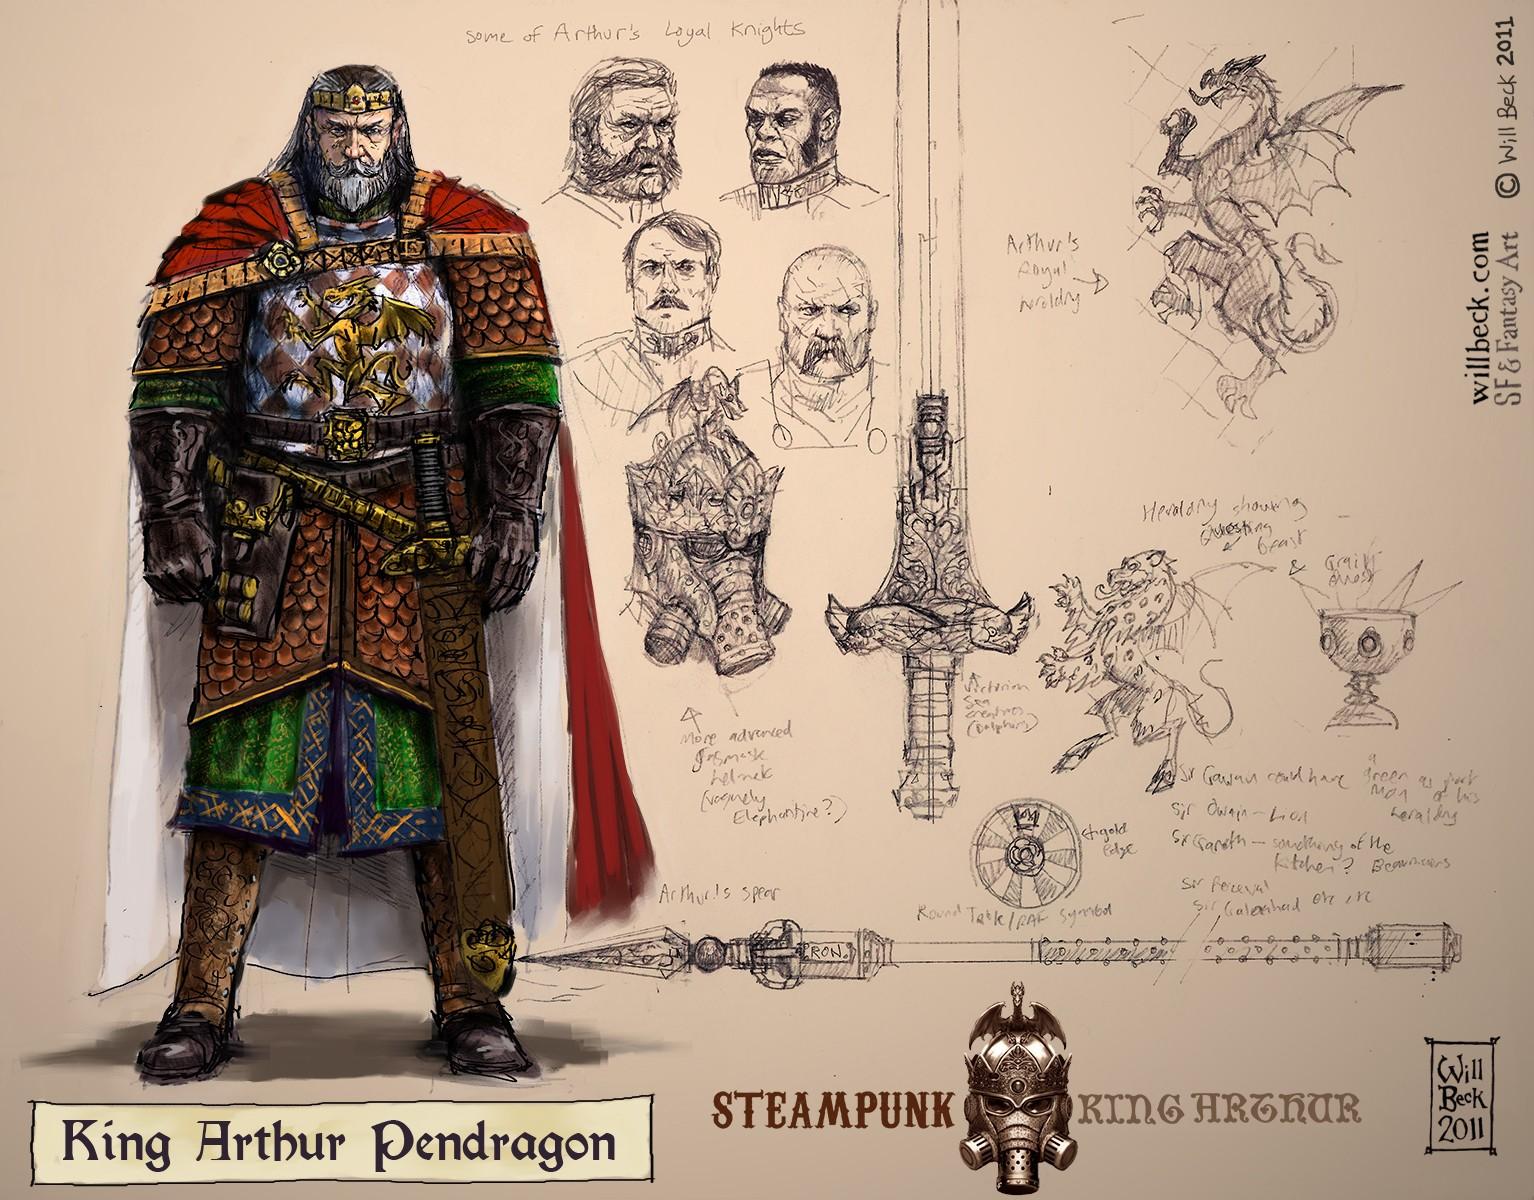 Steampunk King Arthur